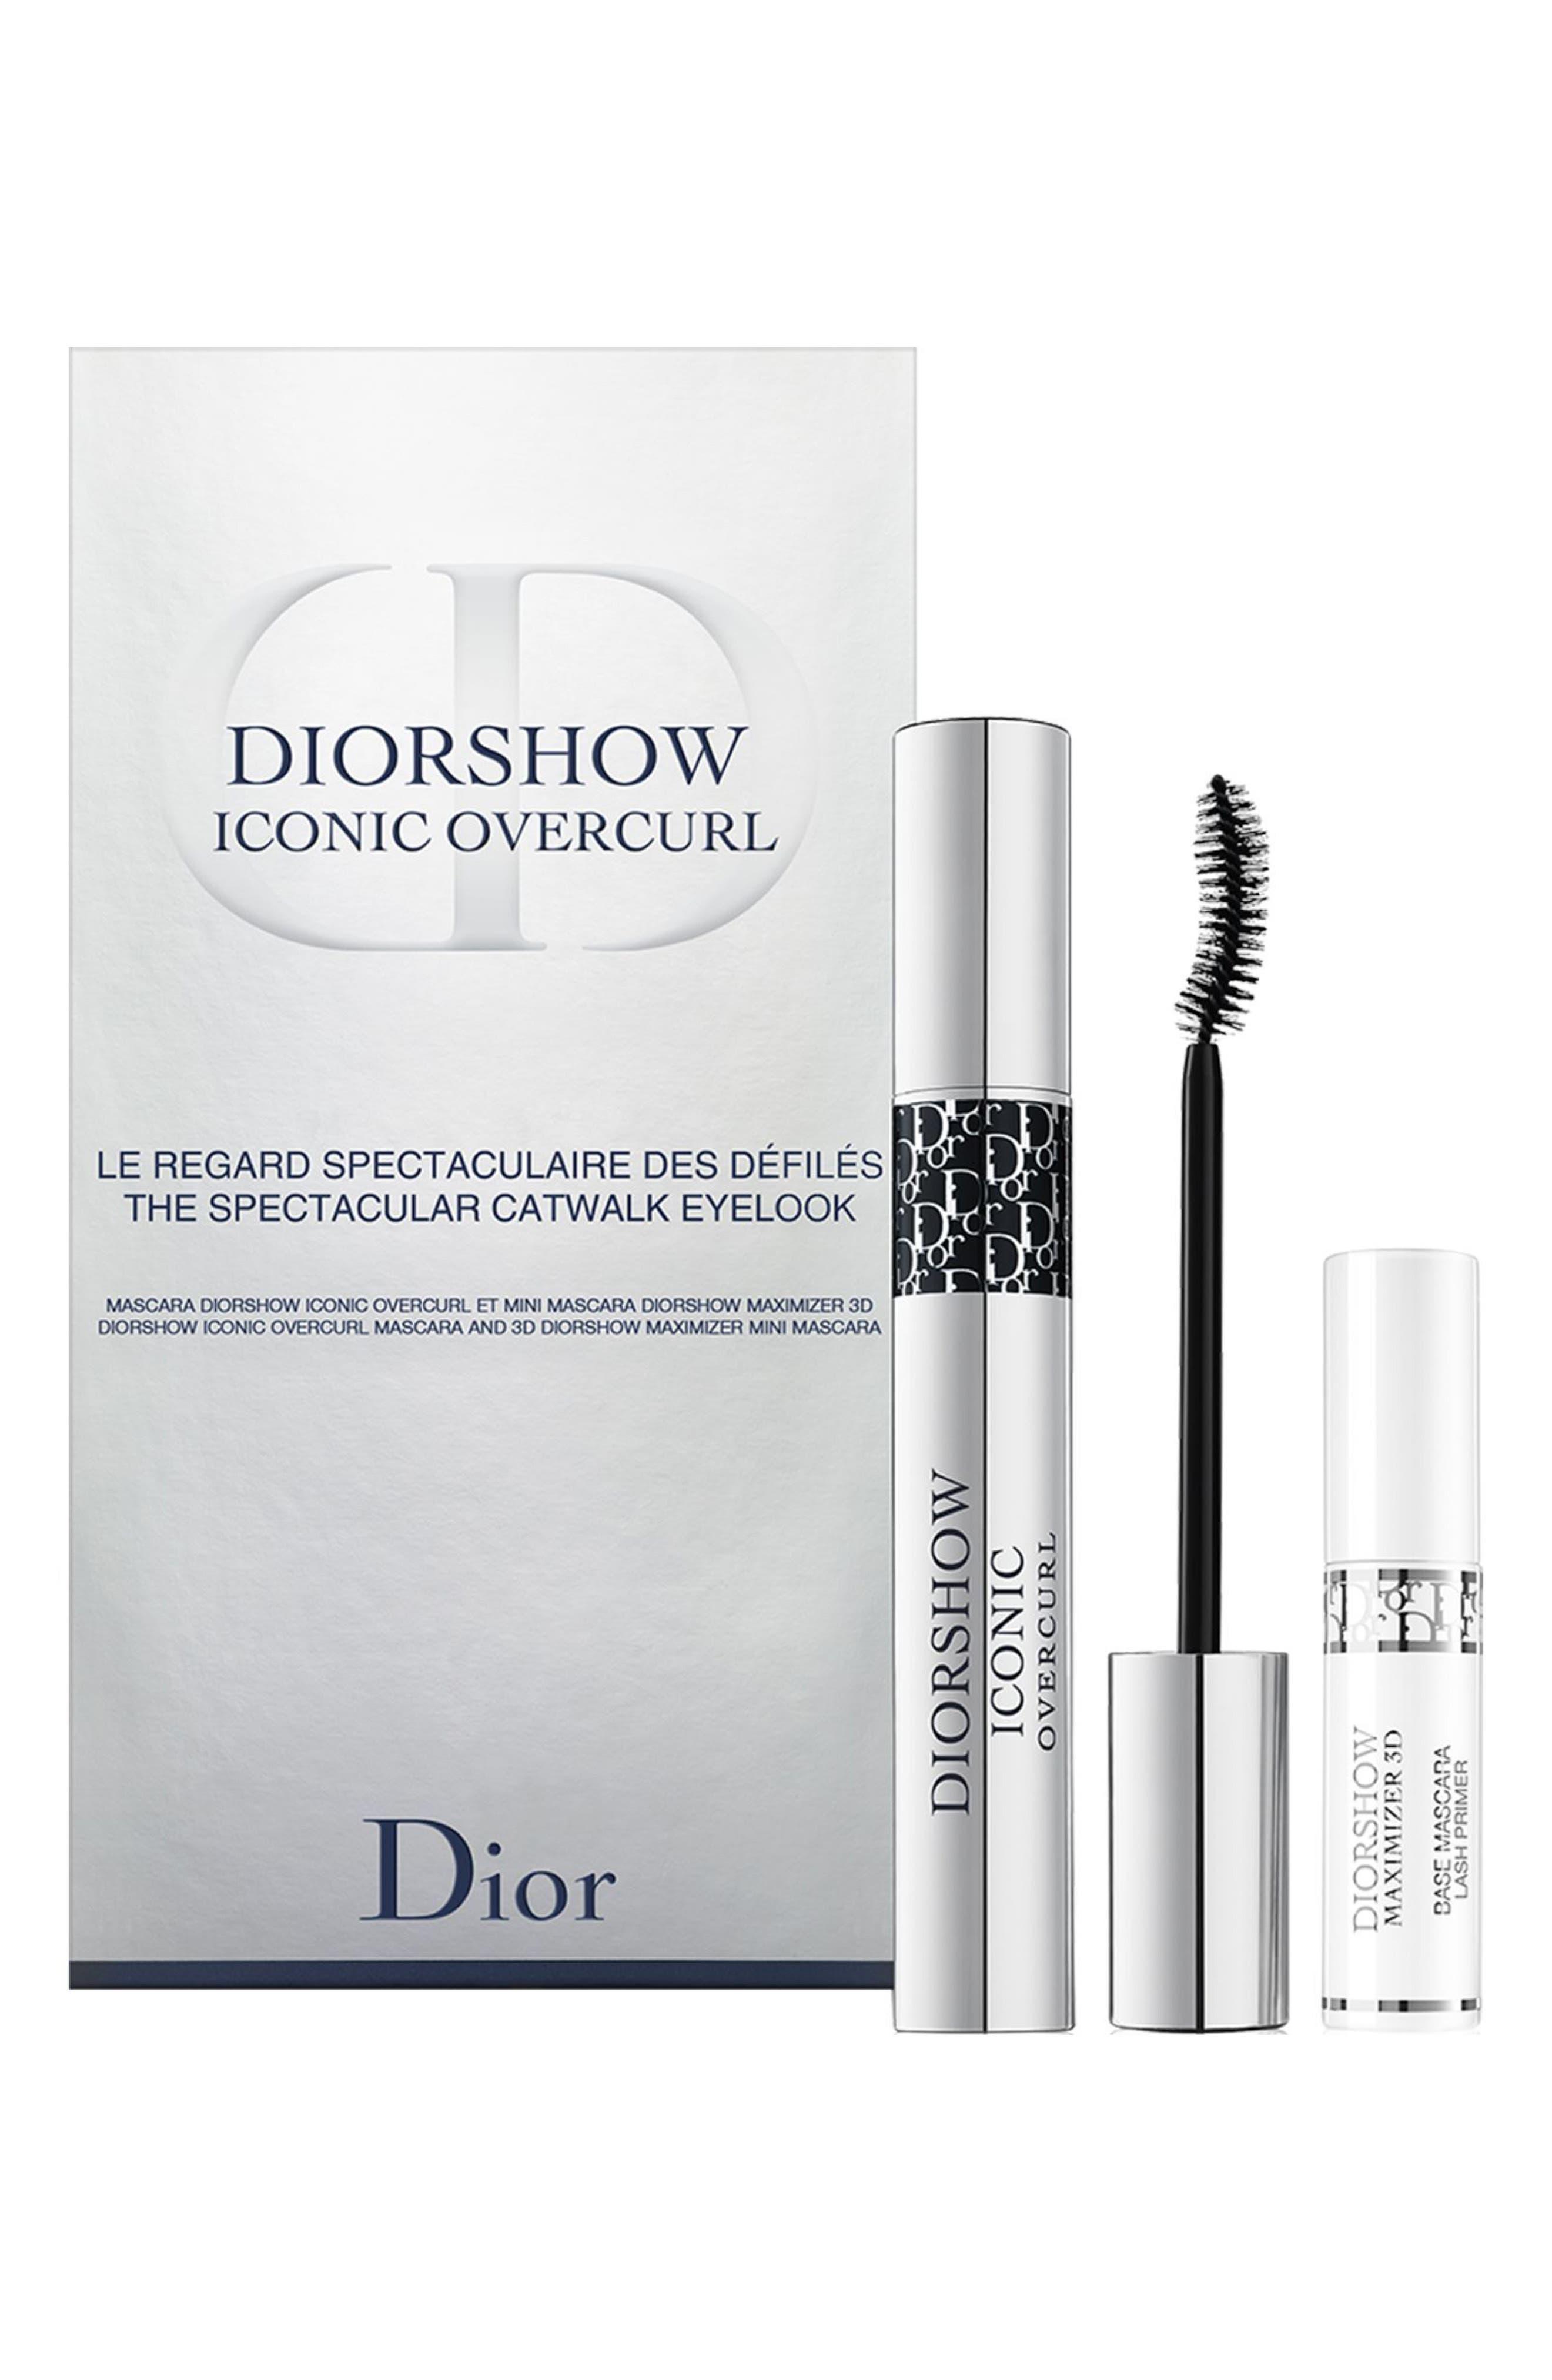 Dior Diorshow Iconic Overcurl The Spectacular Catwalk Mascara Set